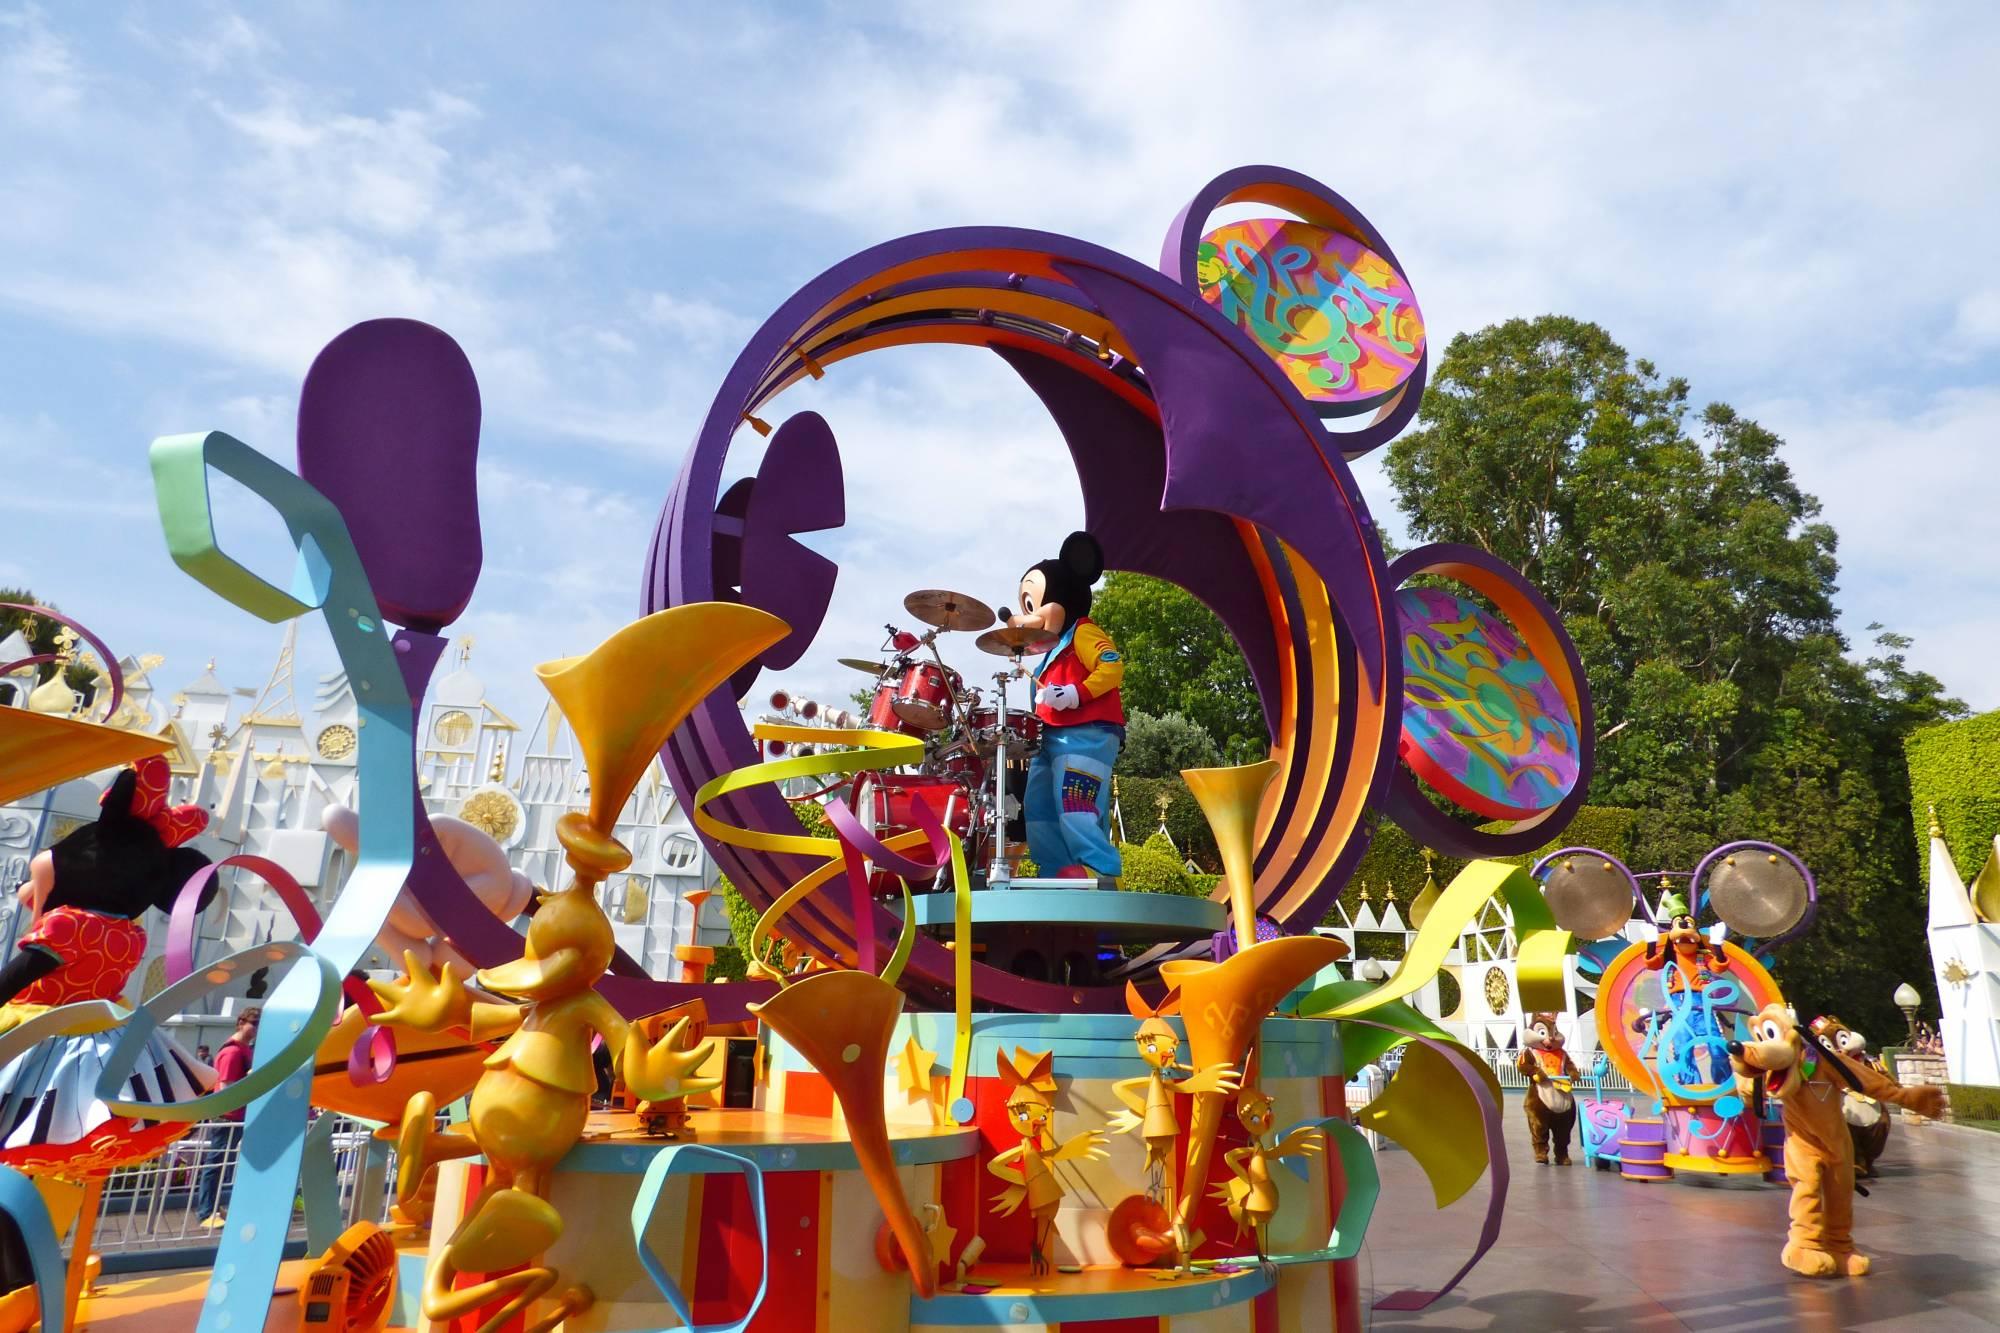 Enjoy Disneyland with all five of your senses! |PassPorter.com